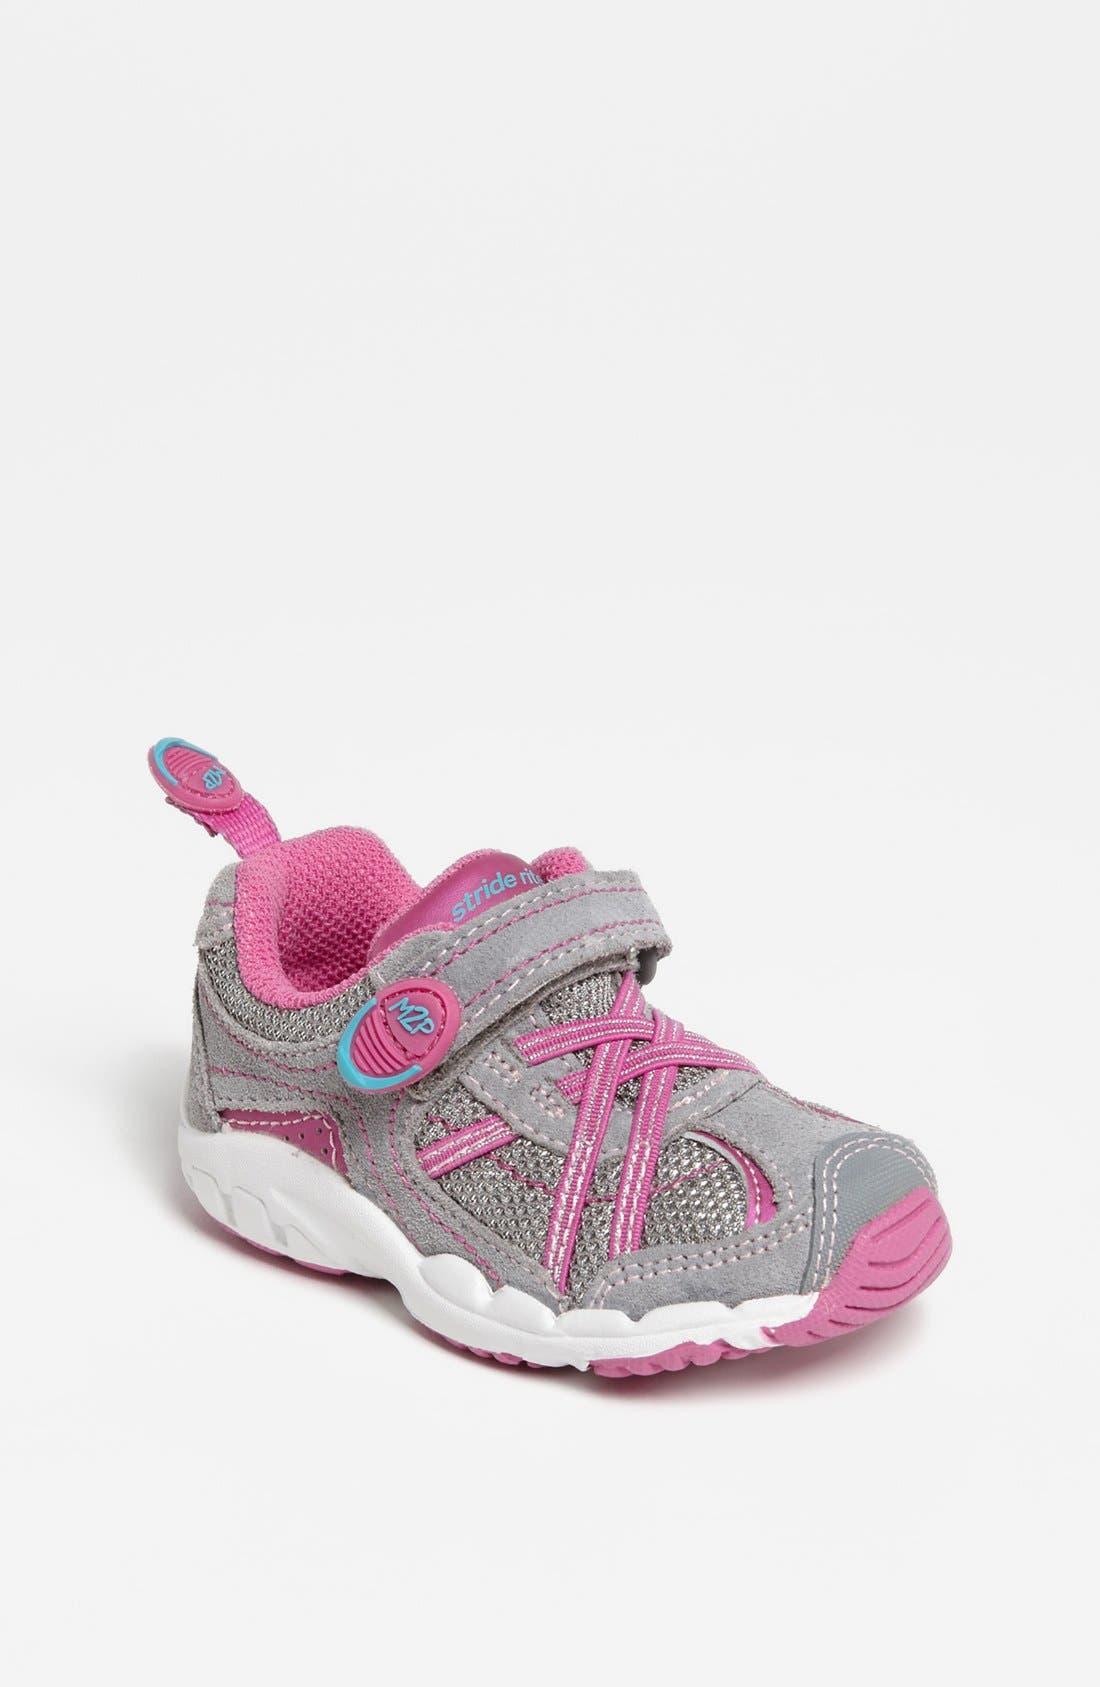 Alternate Image 1 Selected - Stride Rite 'Made 2 Play™ - Kathryn' Sneaker (Baby, Walker & Toddler)